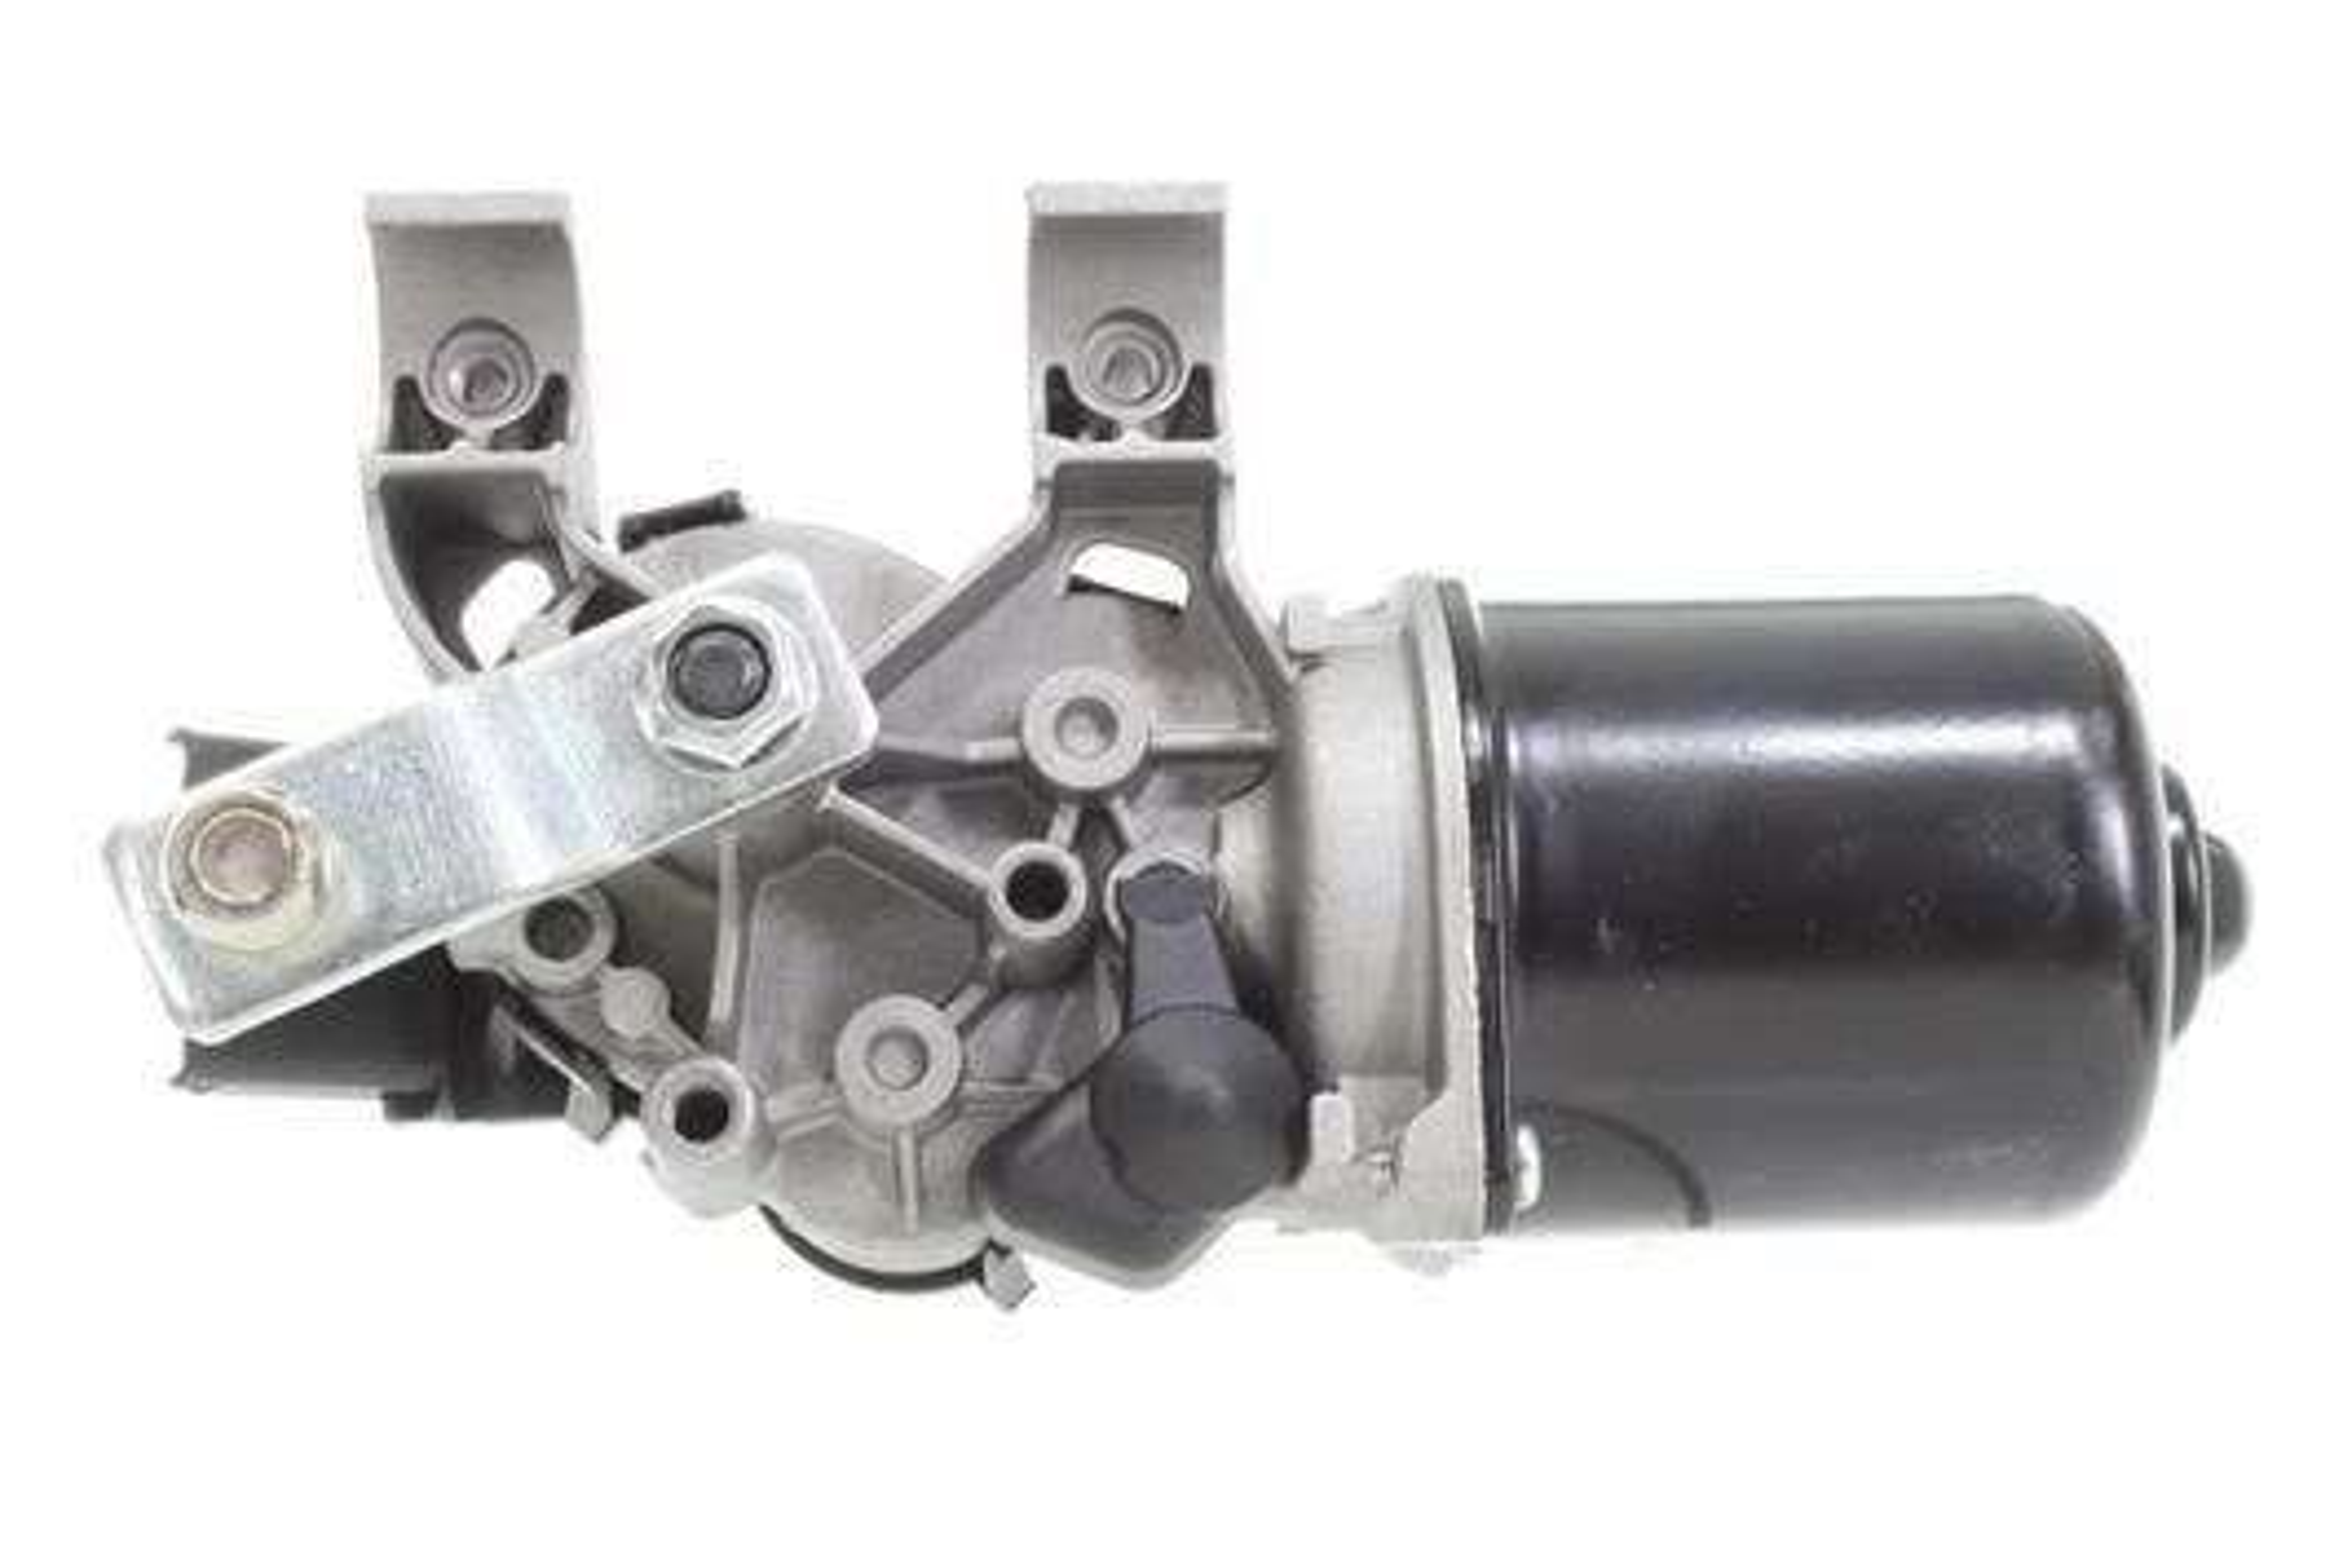 Windshield Wiper Motor 10800159 ALANKO 800159 original quality